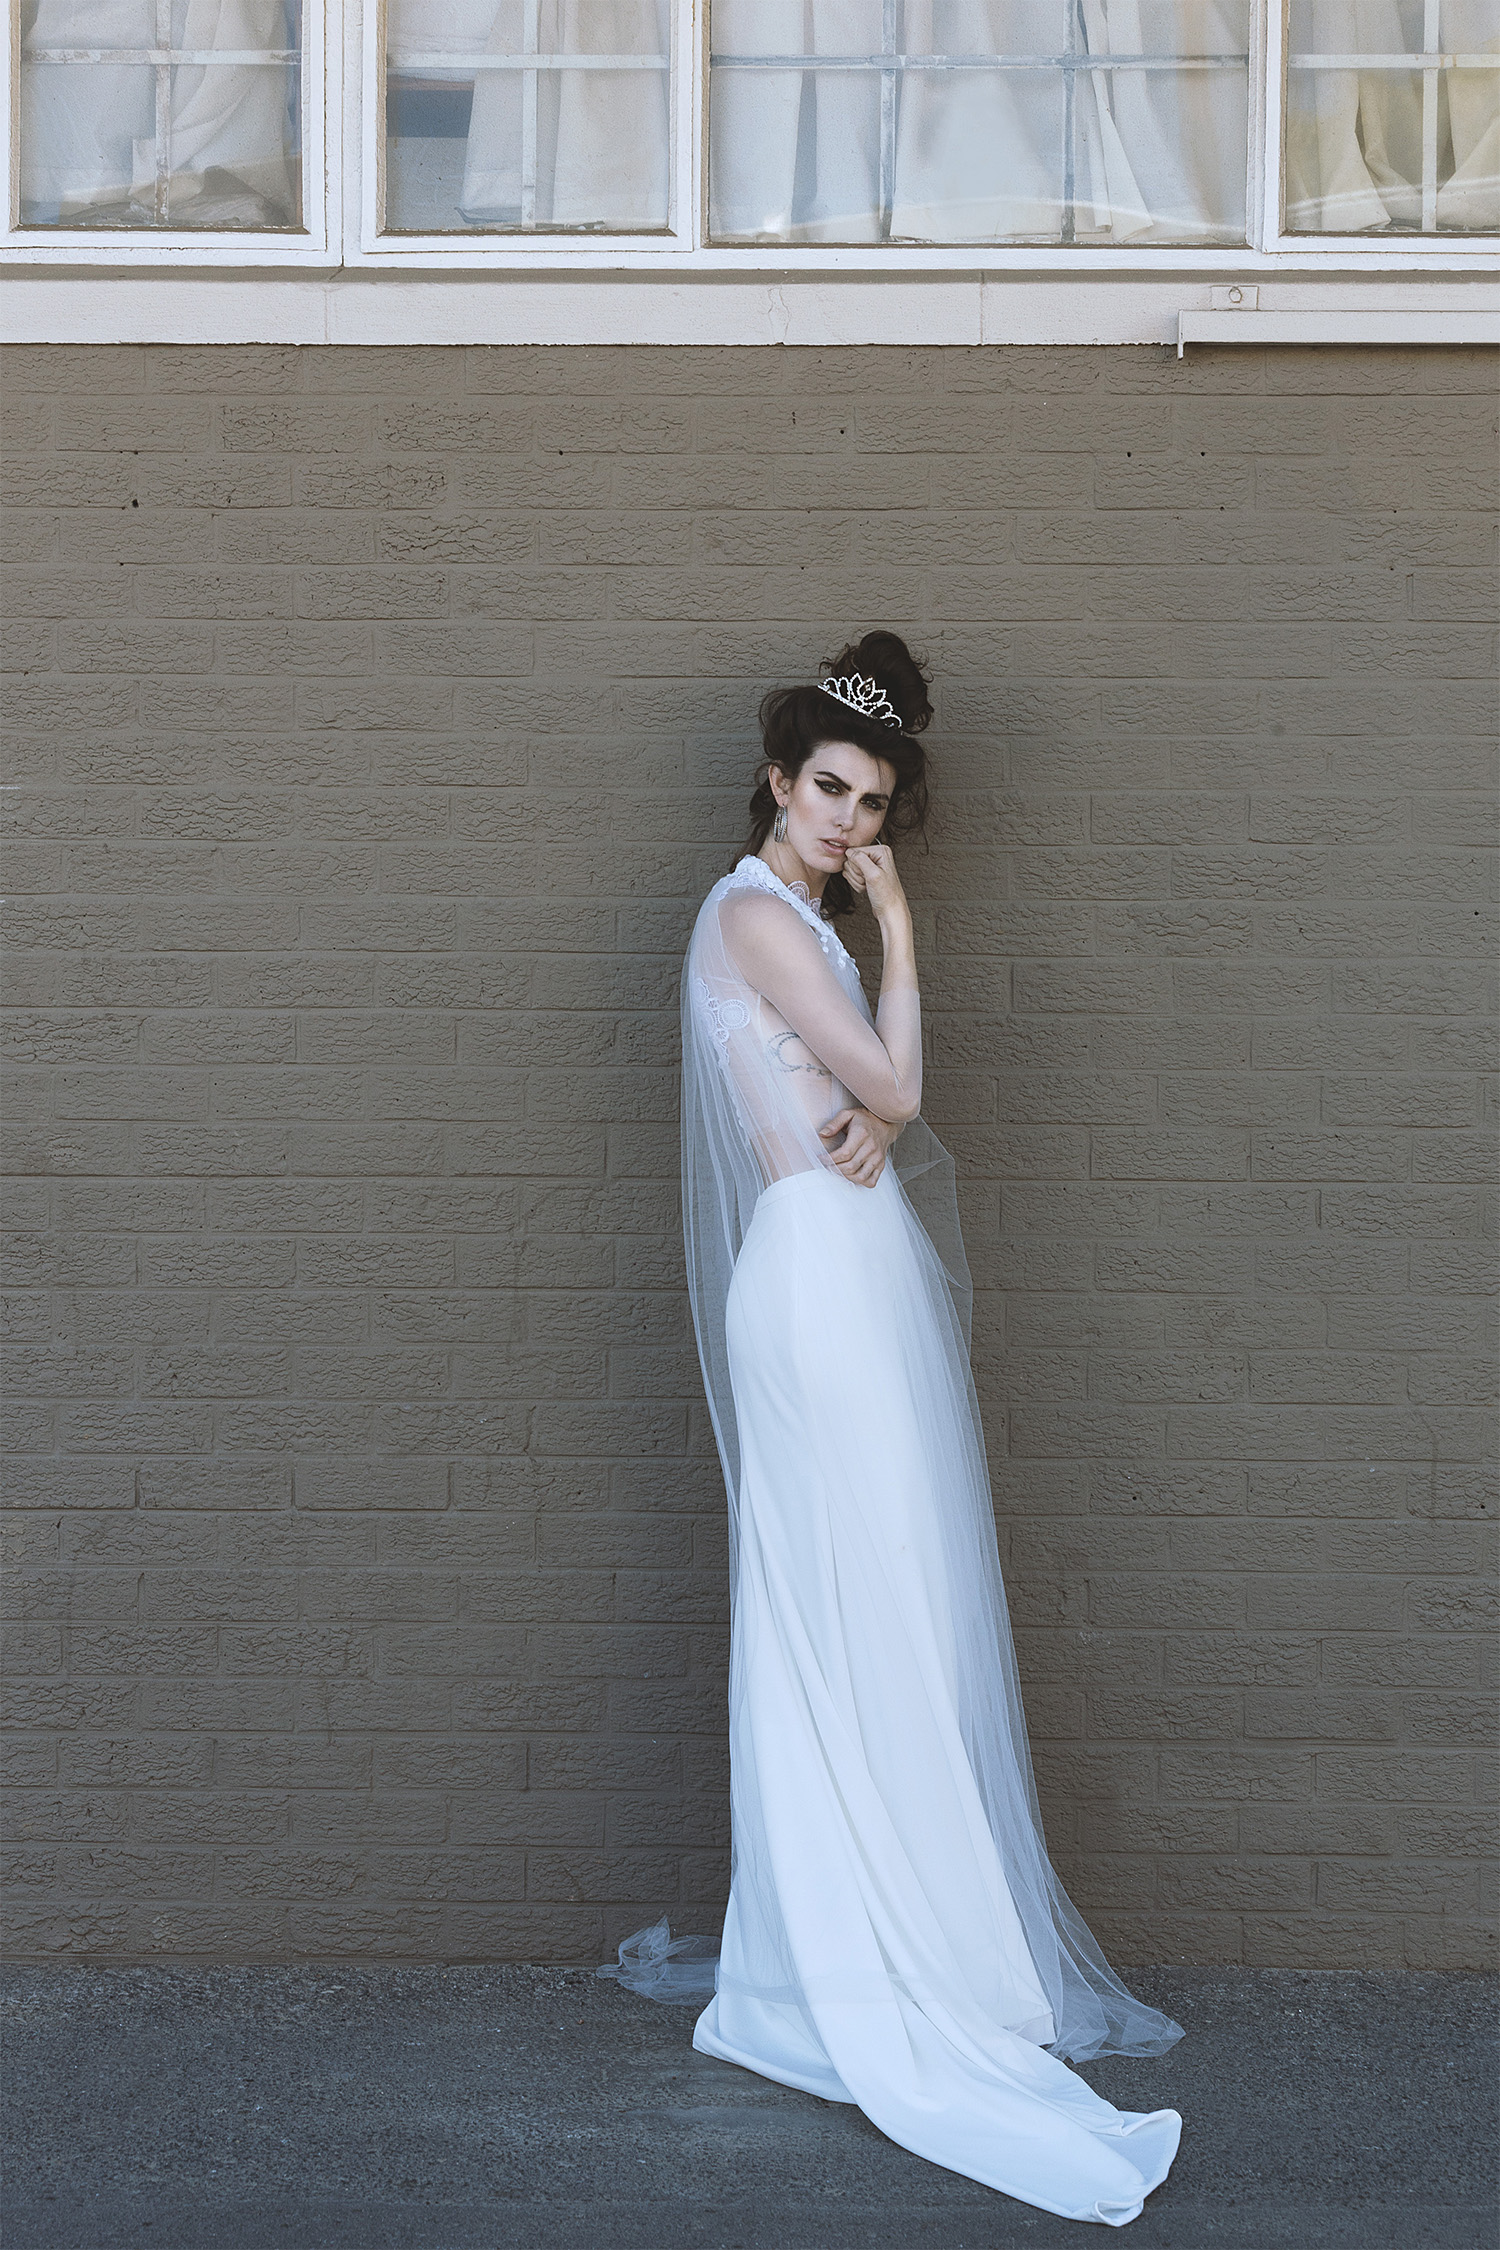 Ally bodysuit,Zara cape, and Mona skirt,Janita Toerien; earrings and crown, Lovisa